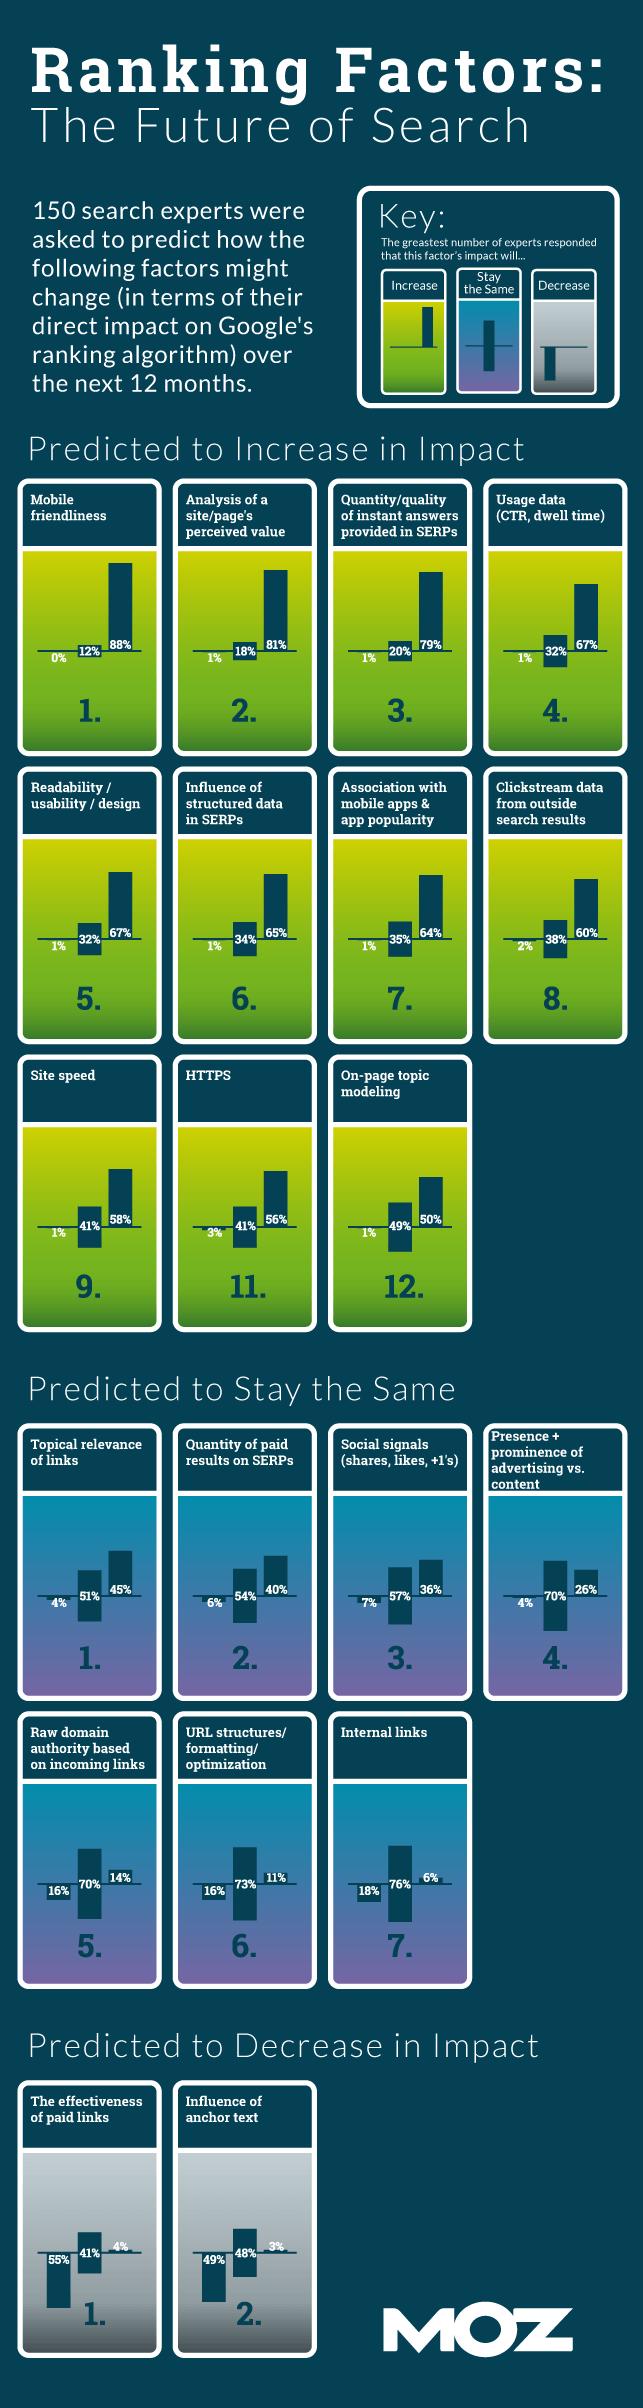 SEOMOZ2015年关于搜索排名因素的调查